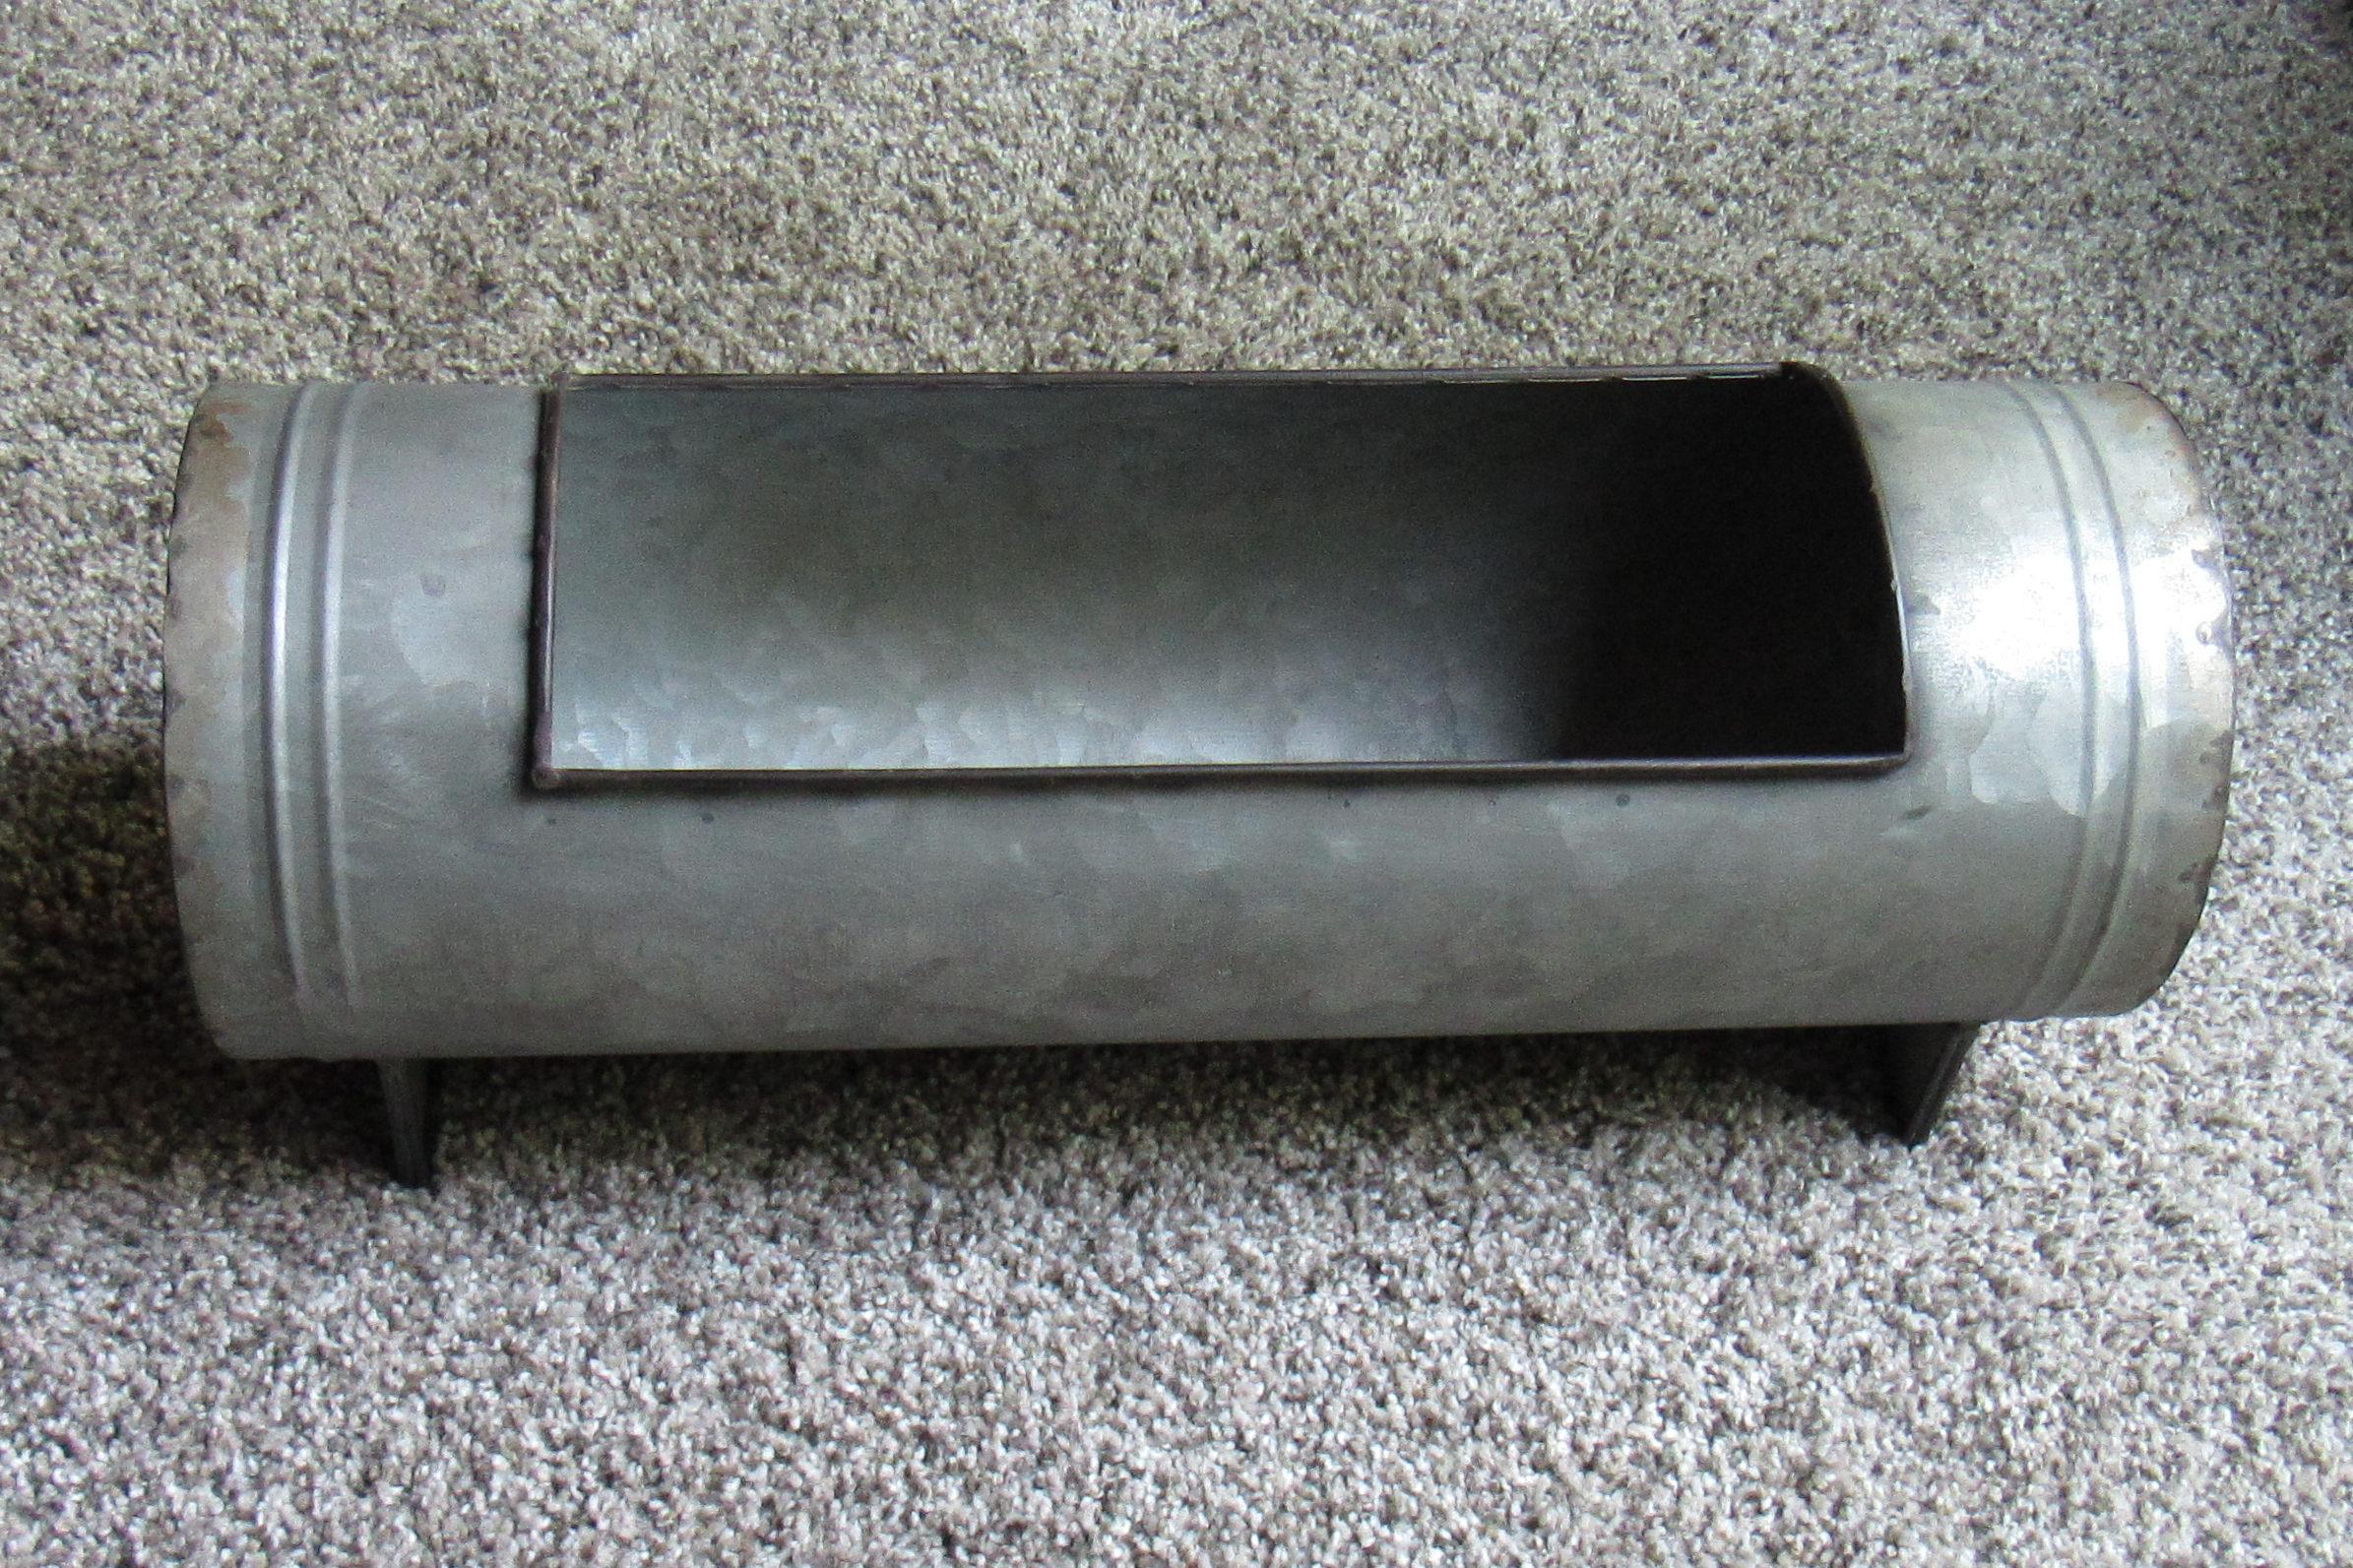 metal-vase-round15-x-5-tmx76134.jpg